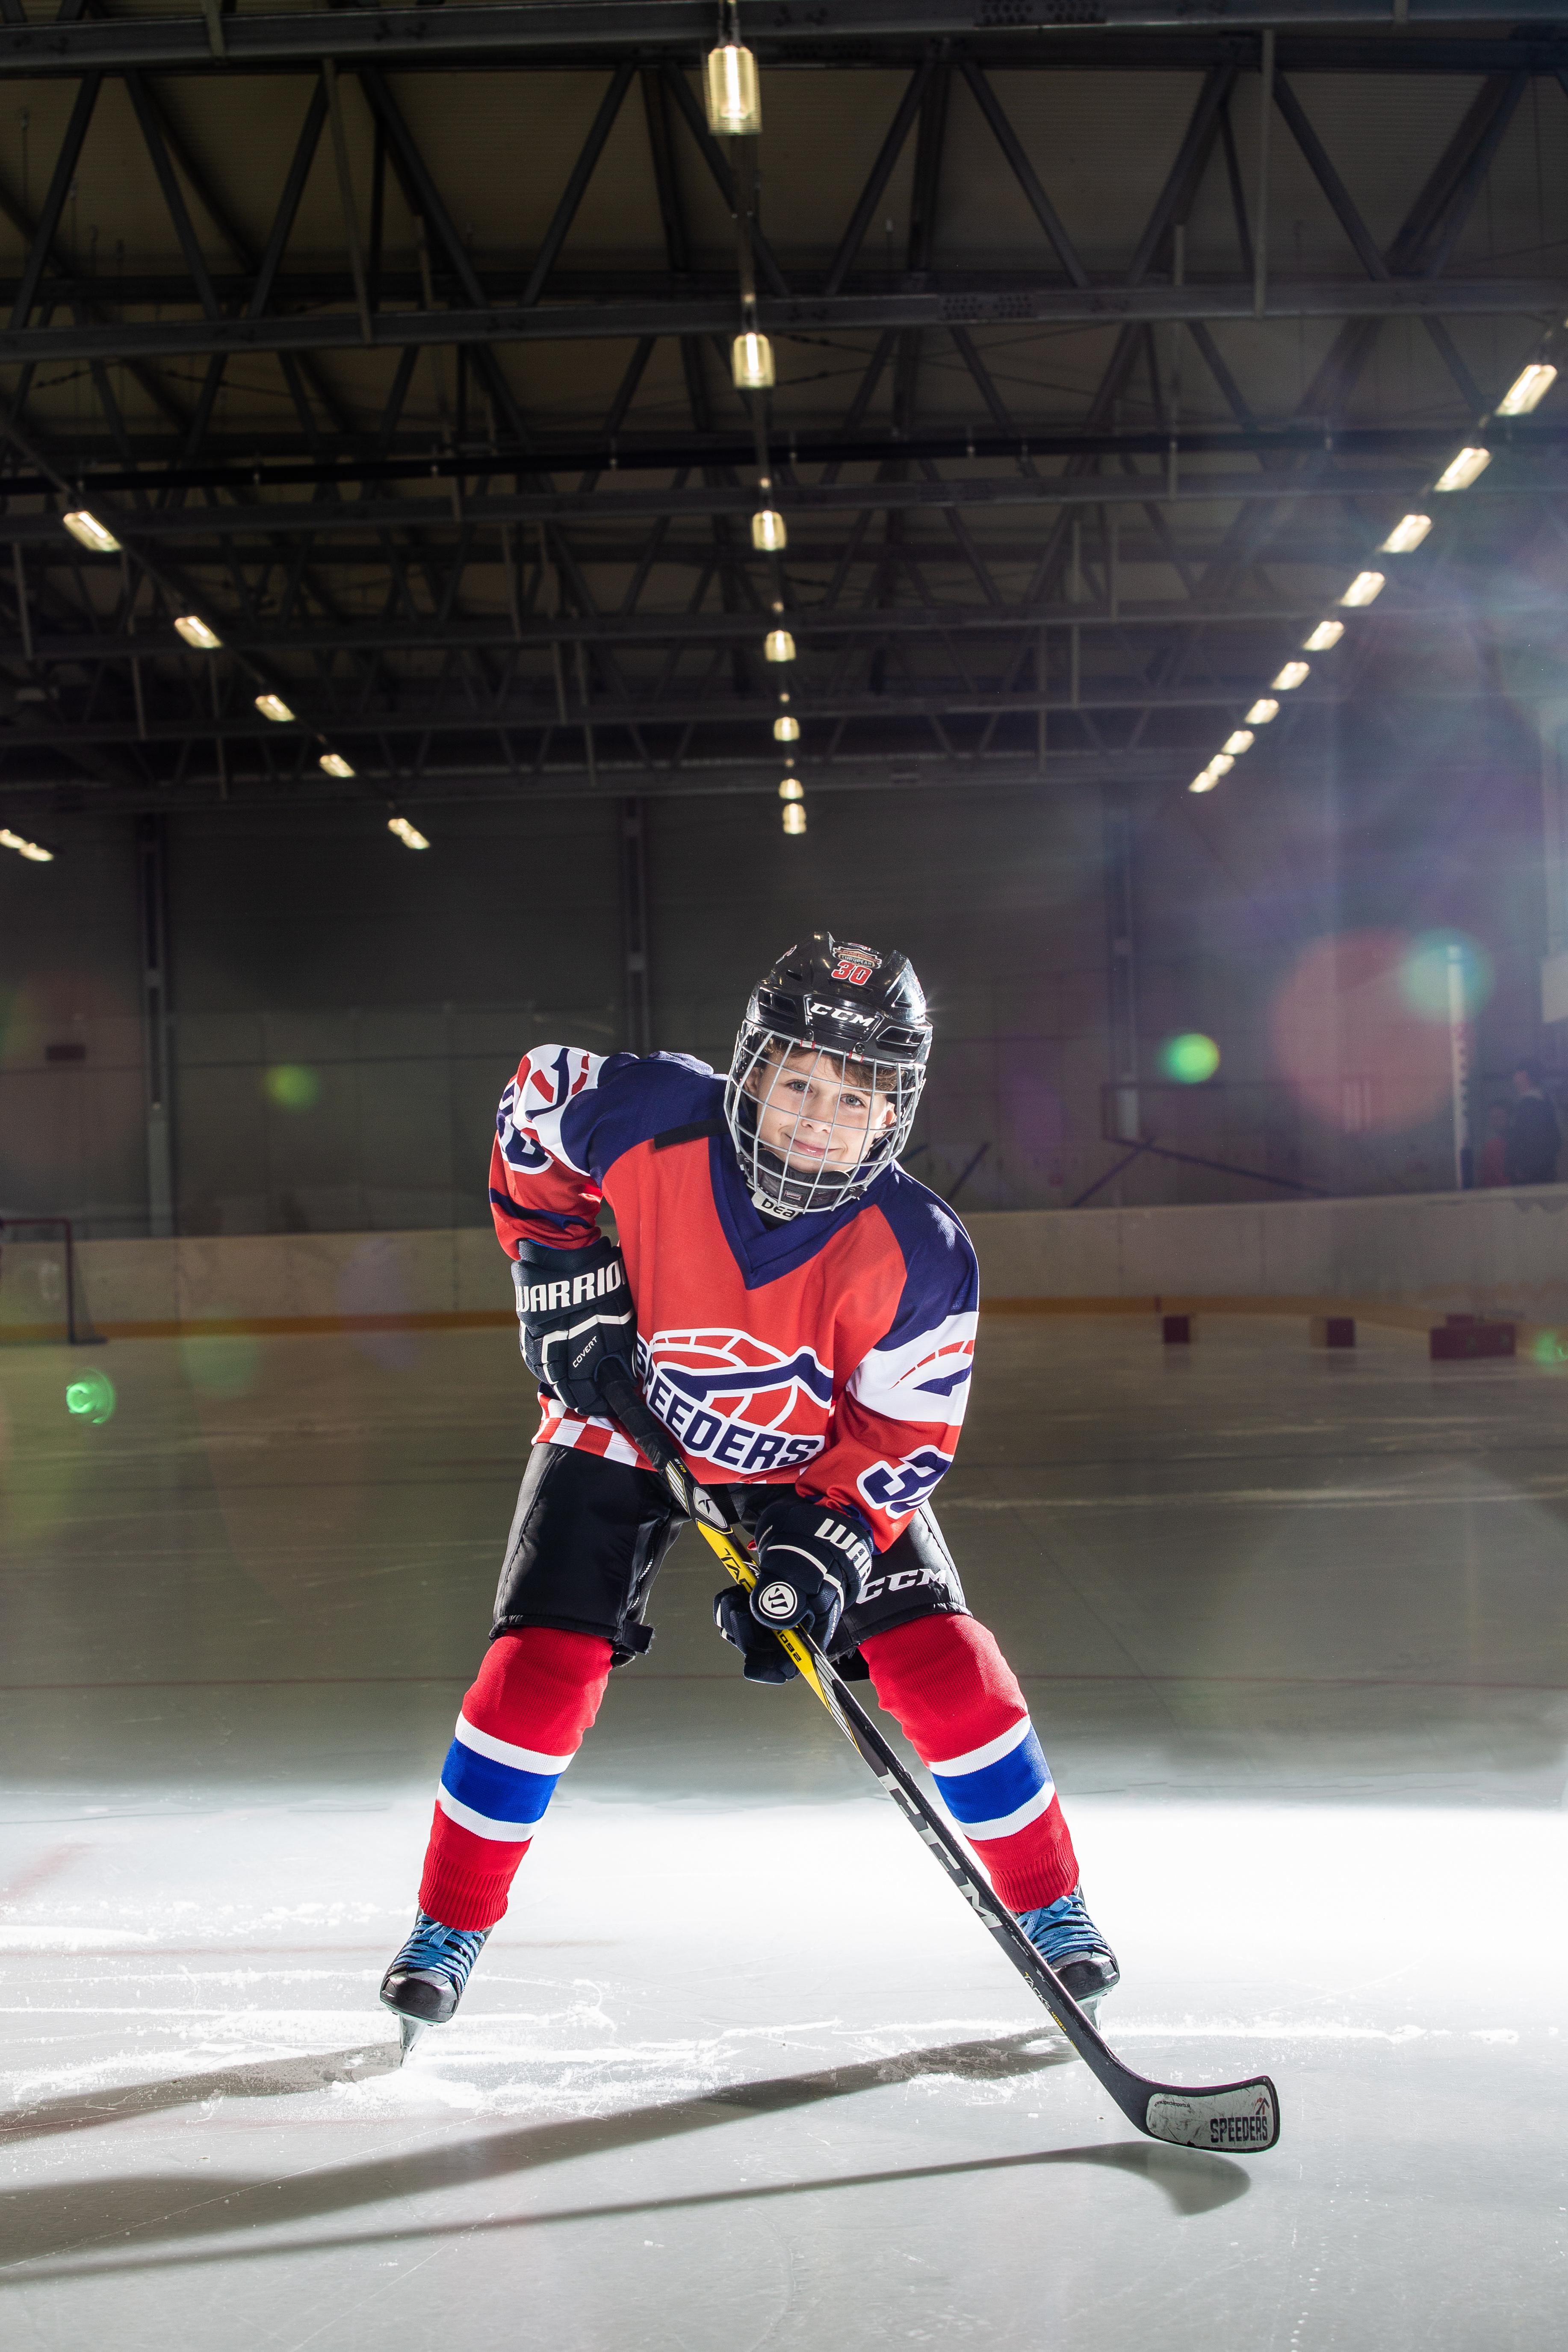 Oliver Samuel Ivanicko Speeders Bratislava cislo 30 hokej